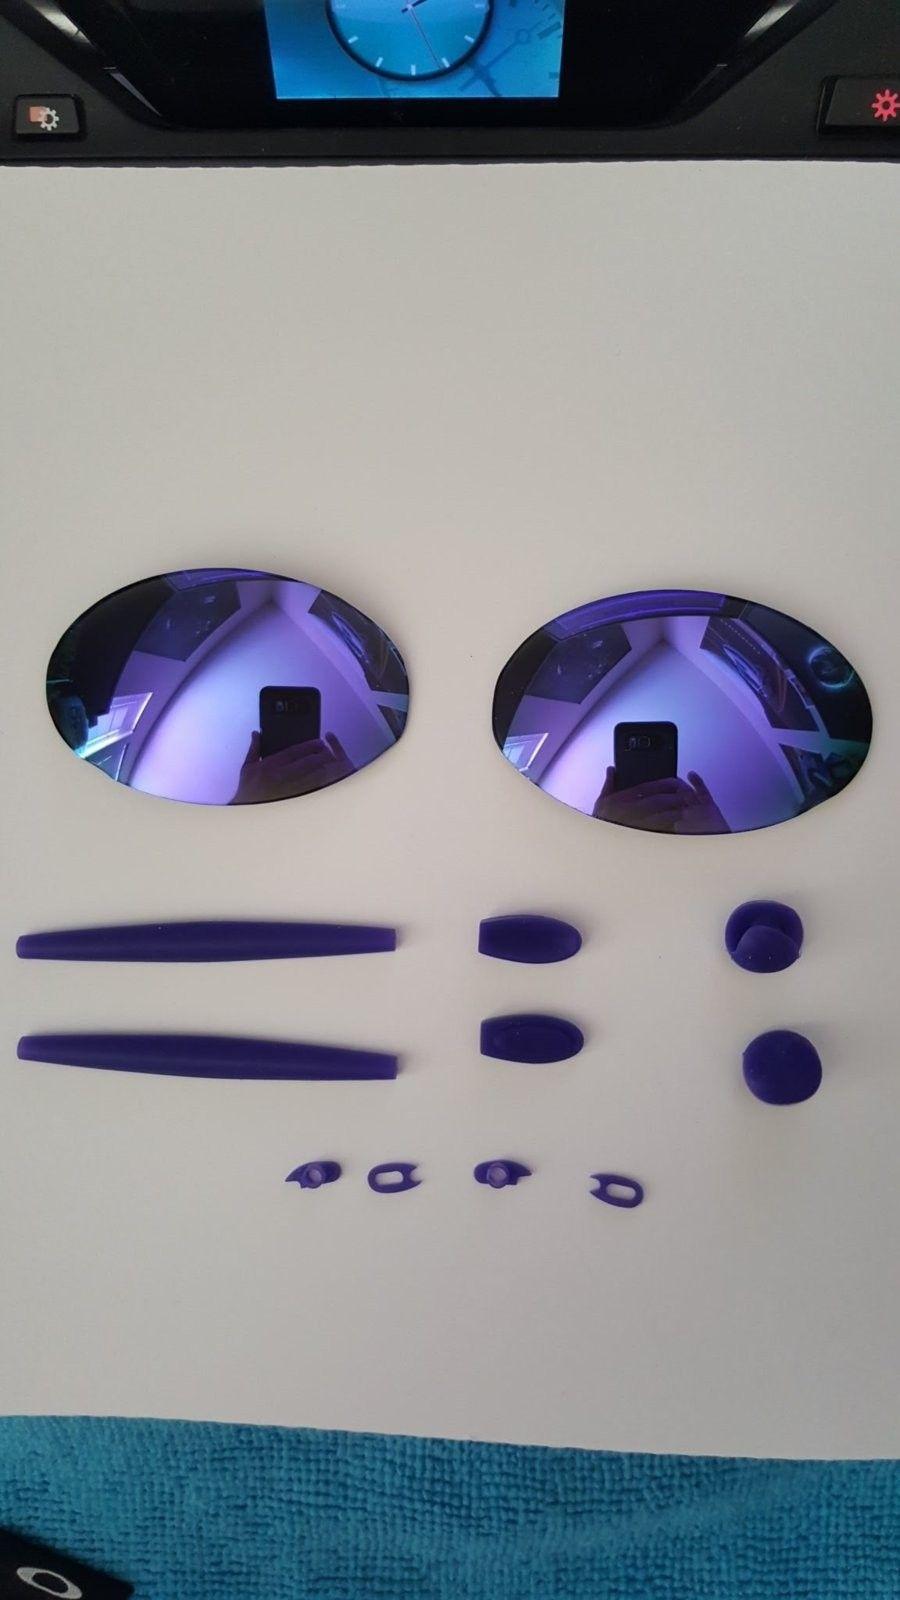 Romeo 1 IH style  Purple Lens/Rubbers 135.00 - Conus  - obo considered - 20151108_140926.jpg.jpeg